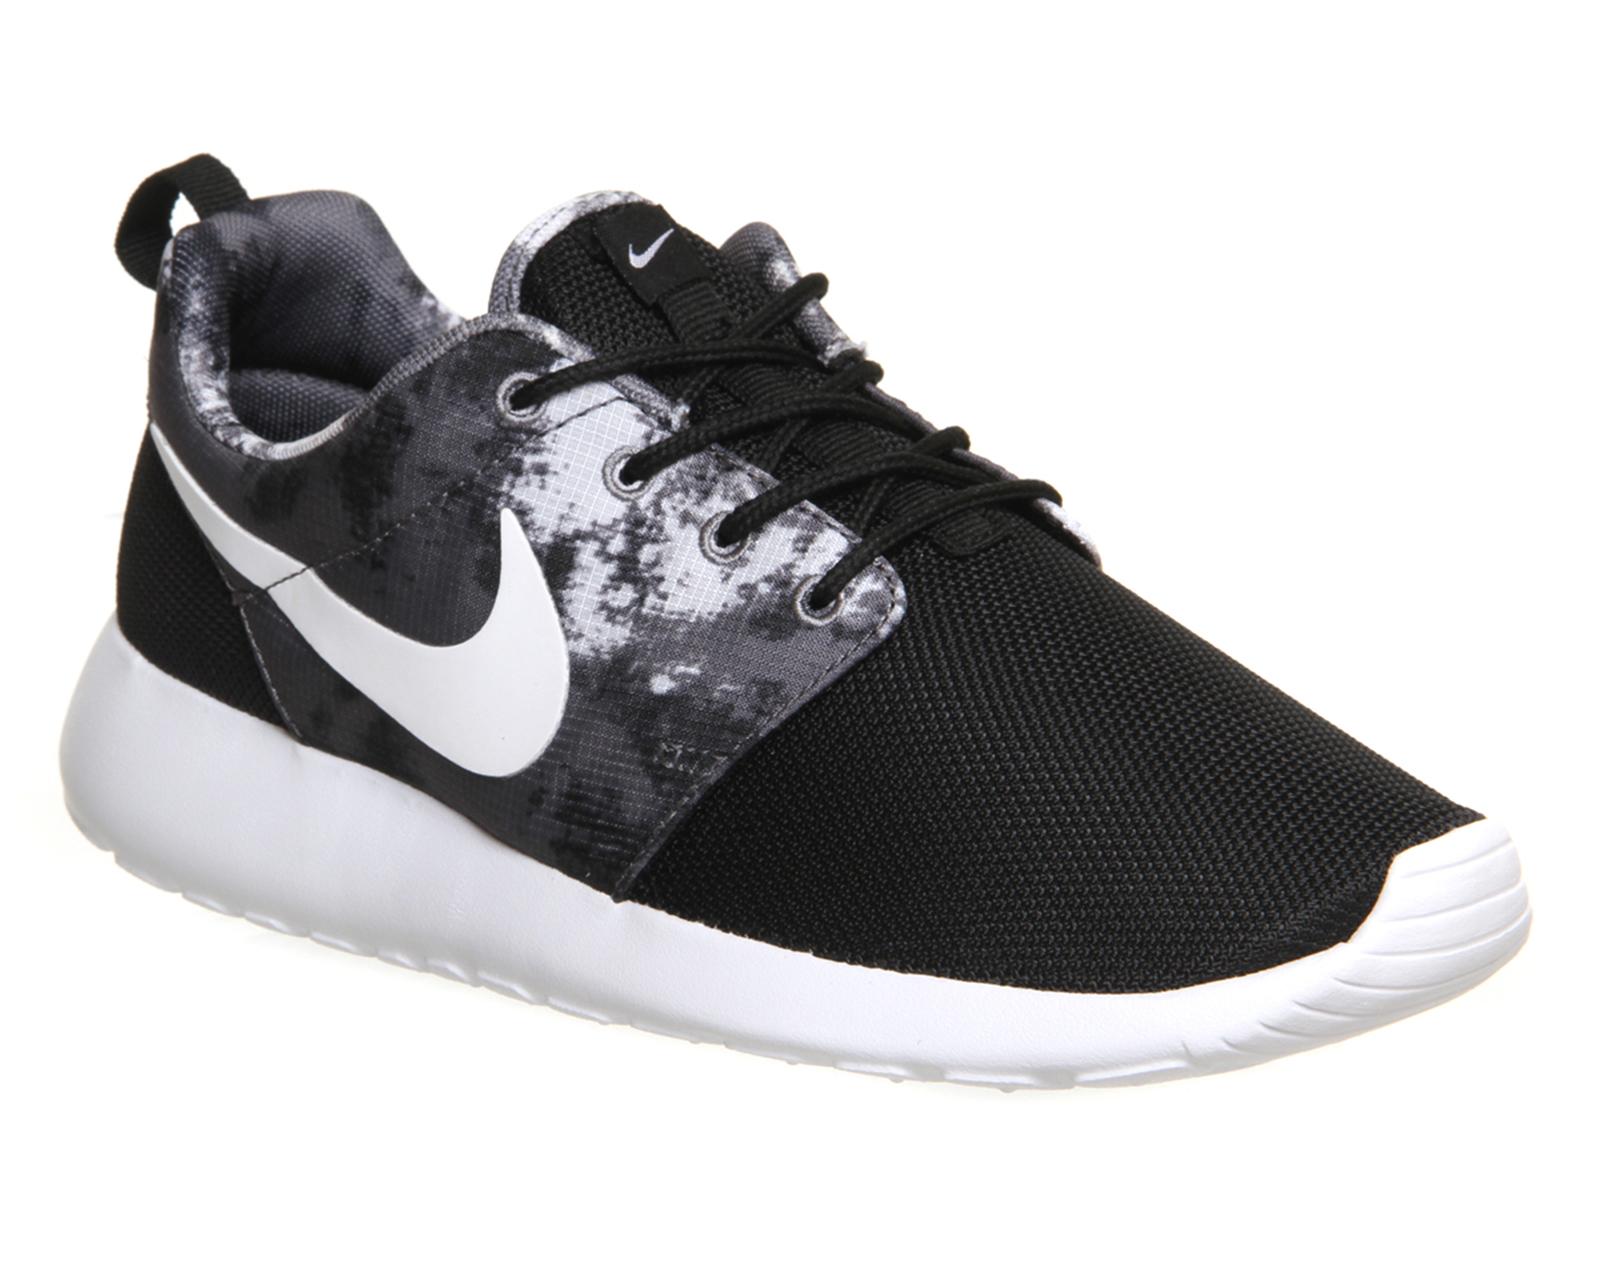 nike roshe cool grey black and white